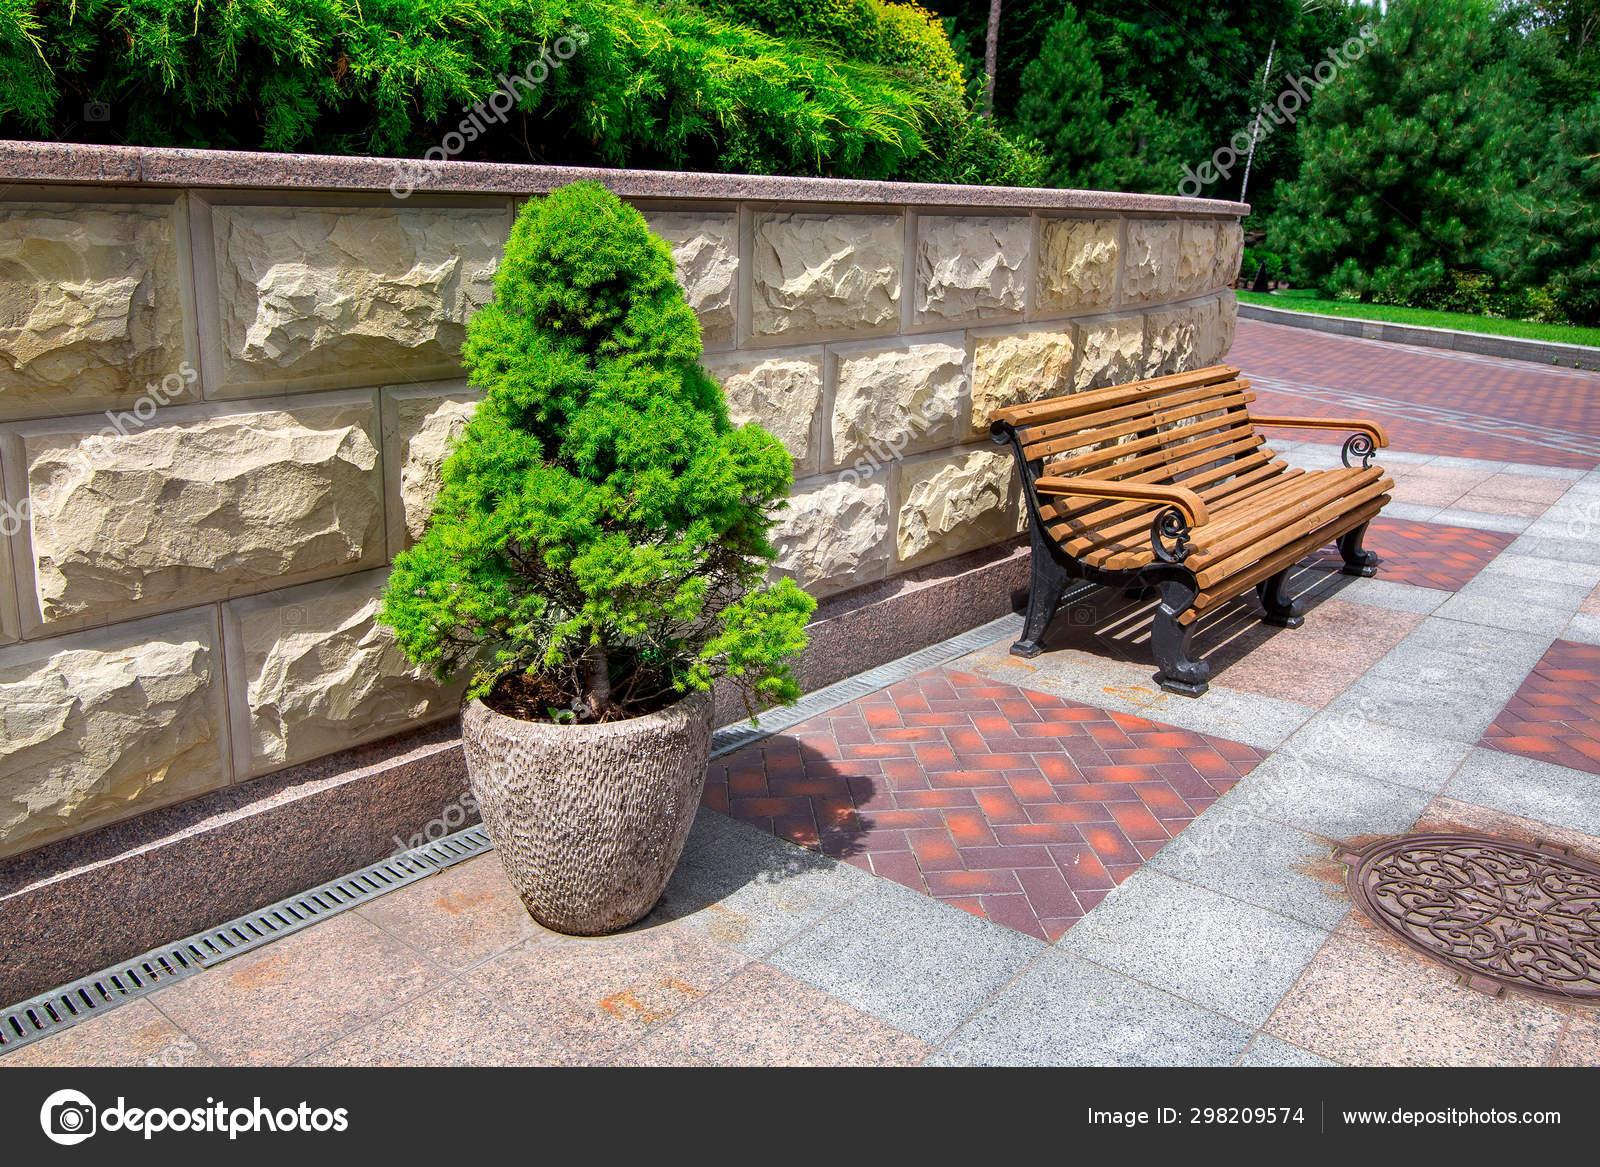 Awe Inspiring Stone Flowerpot Evergreen Tree Wooden Bench Stone Wall Pdpeps Interior Chair Design Pdpepsorg